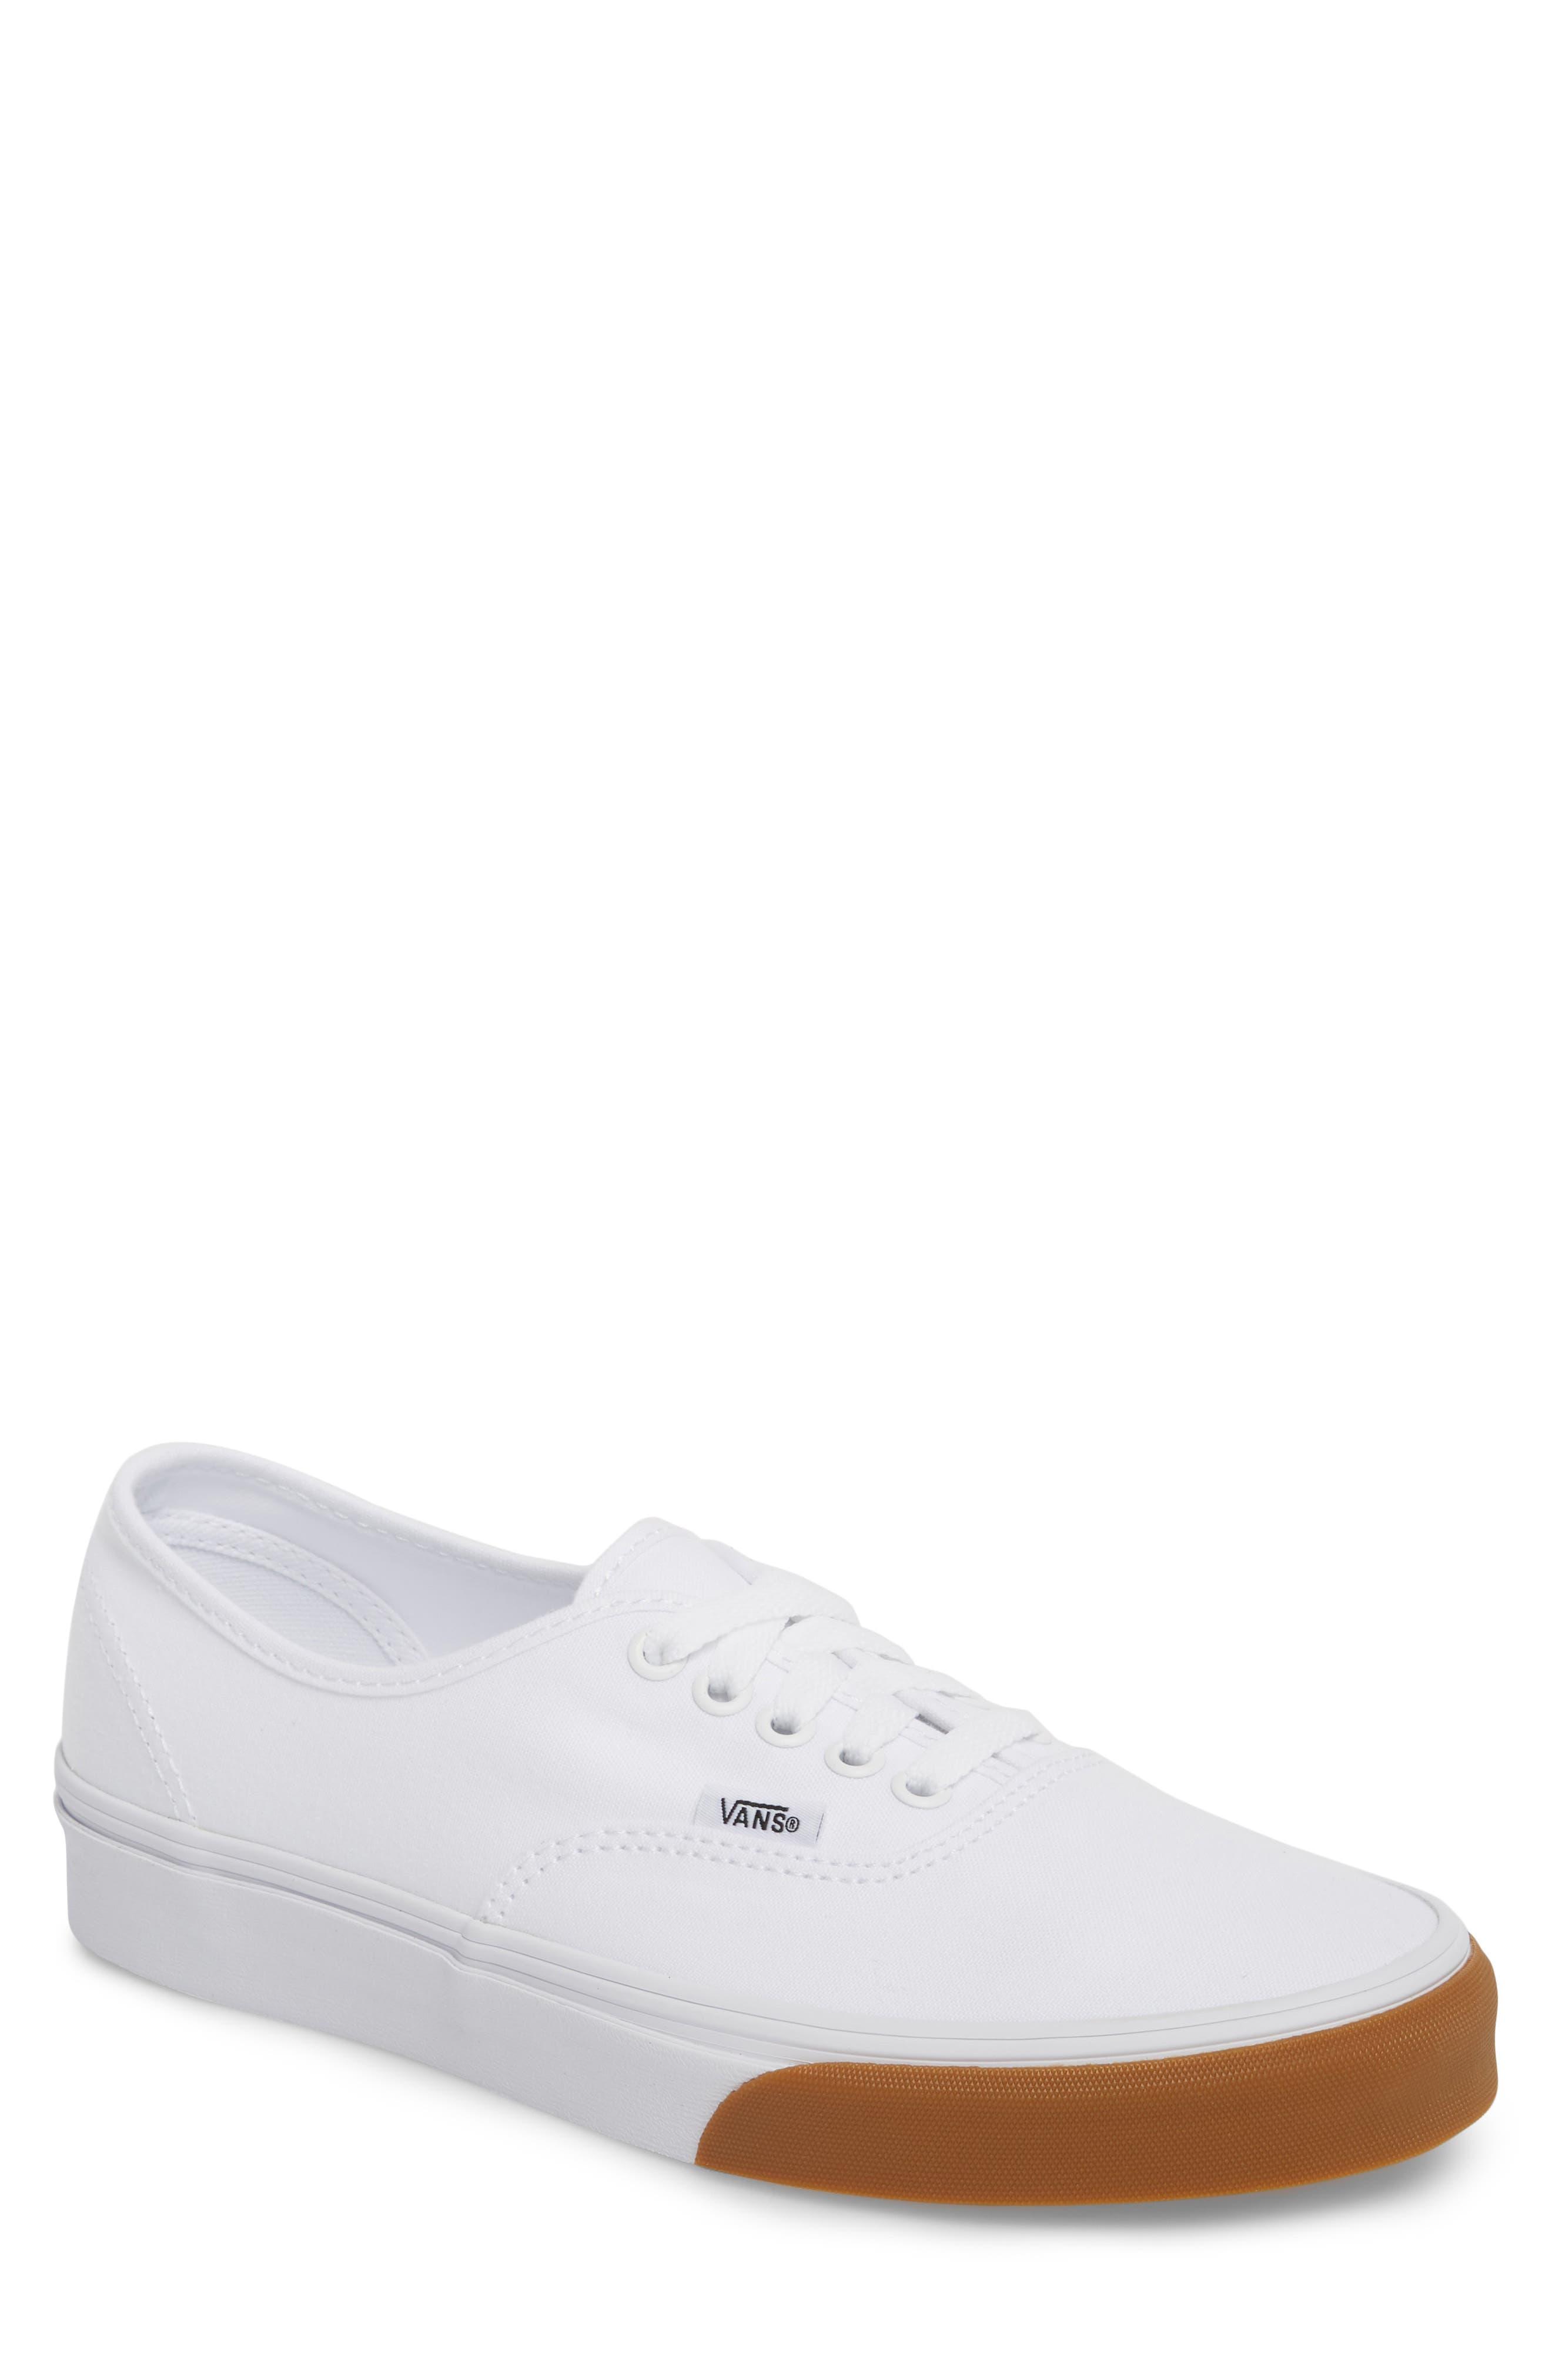 Authentic Gum Bumper Sneaker,                             Main thumbnail 1, color,                             True White/ True White